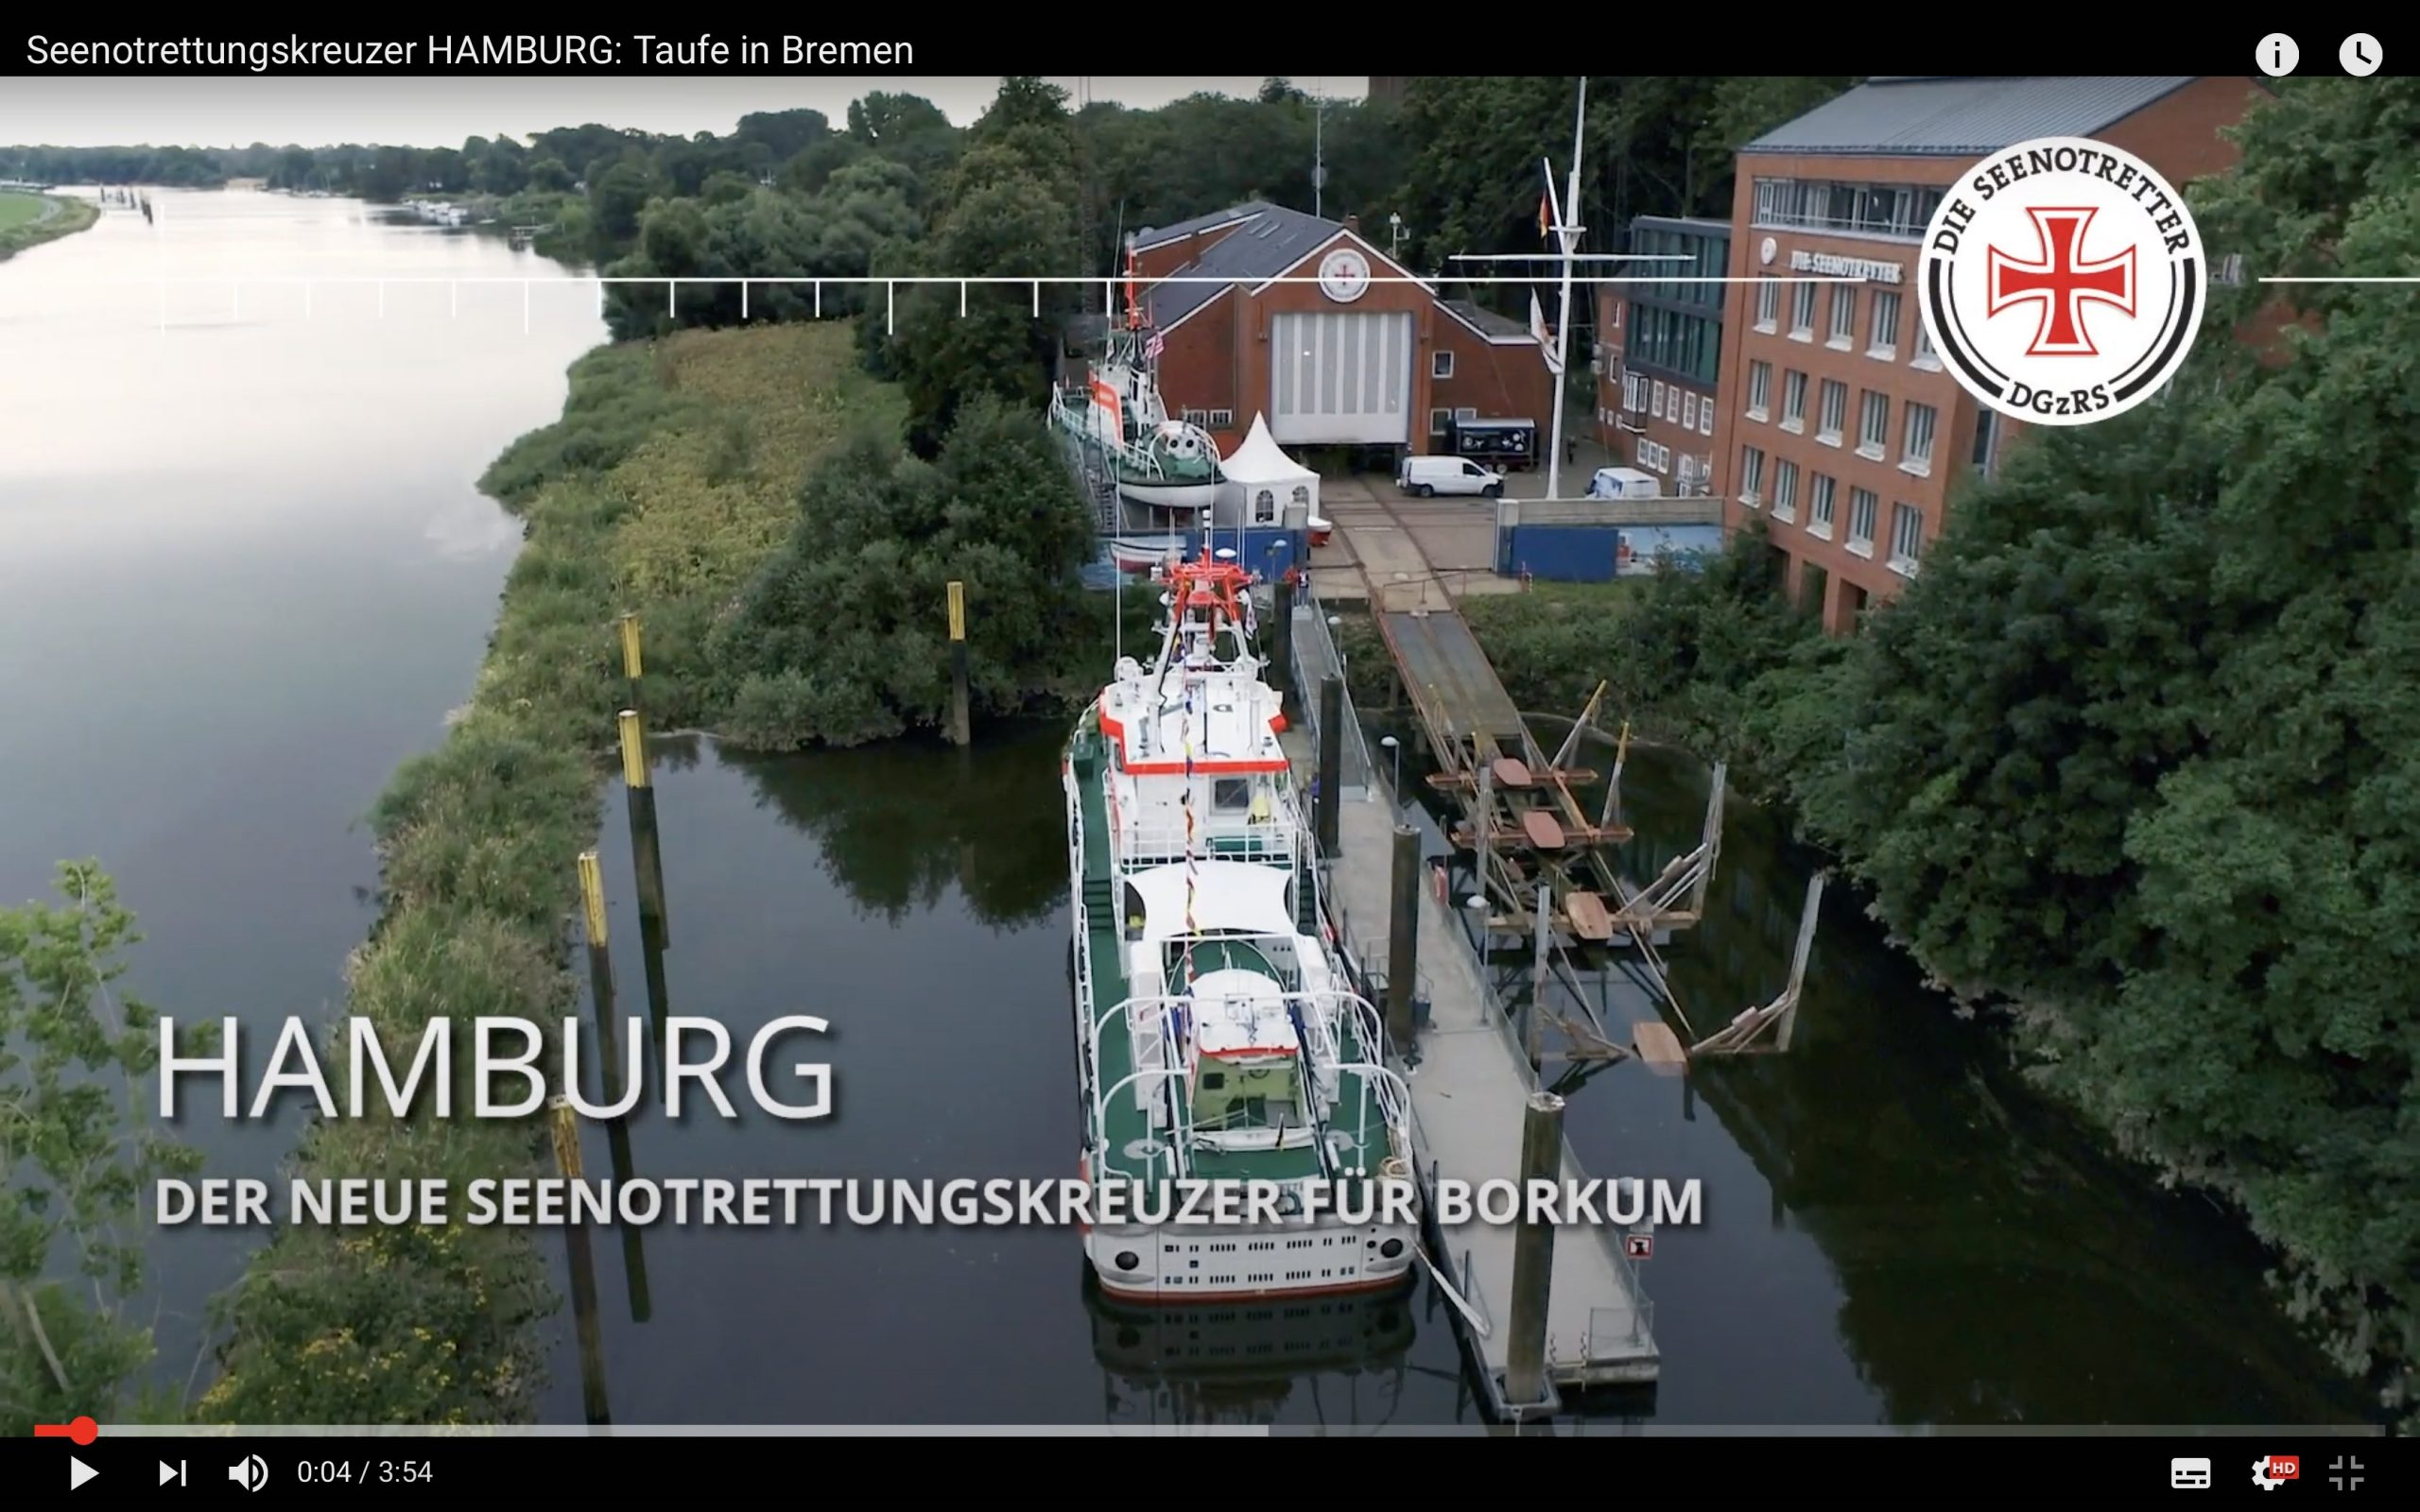 Rettungskreuzer Hamburg Taufe